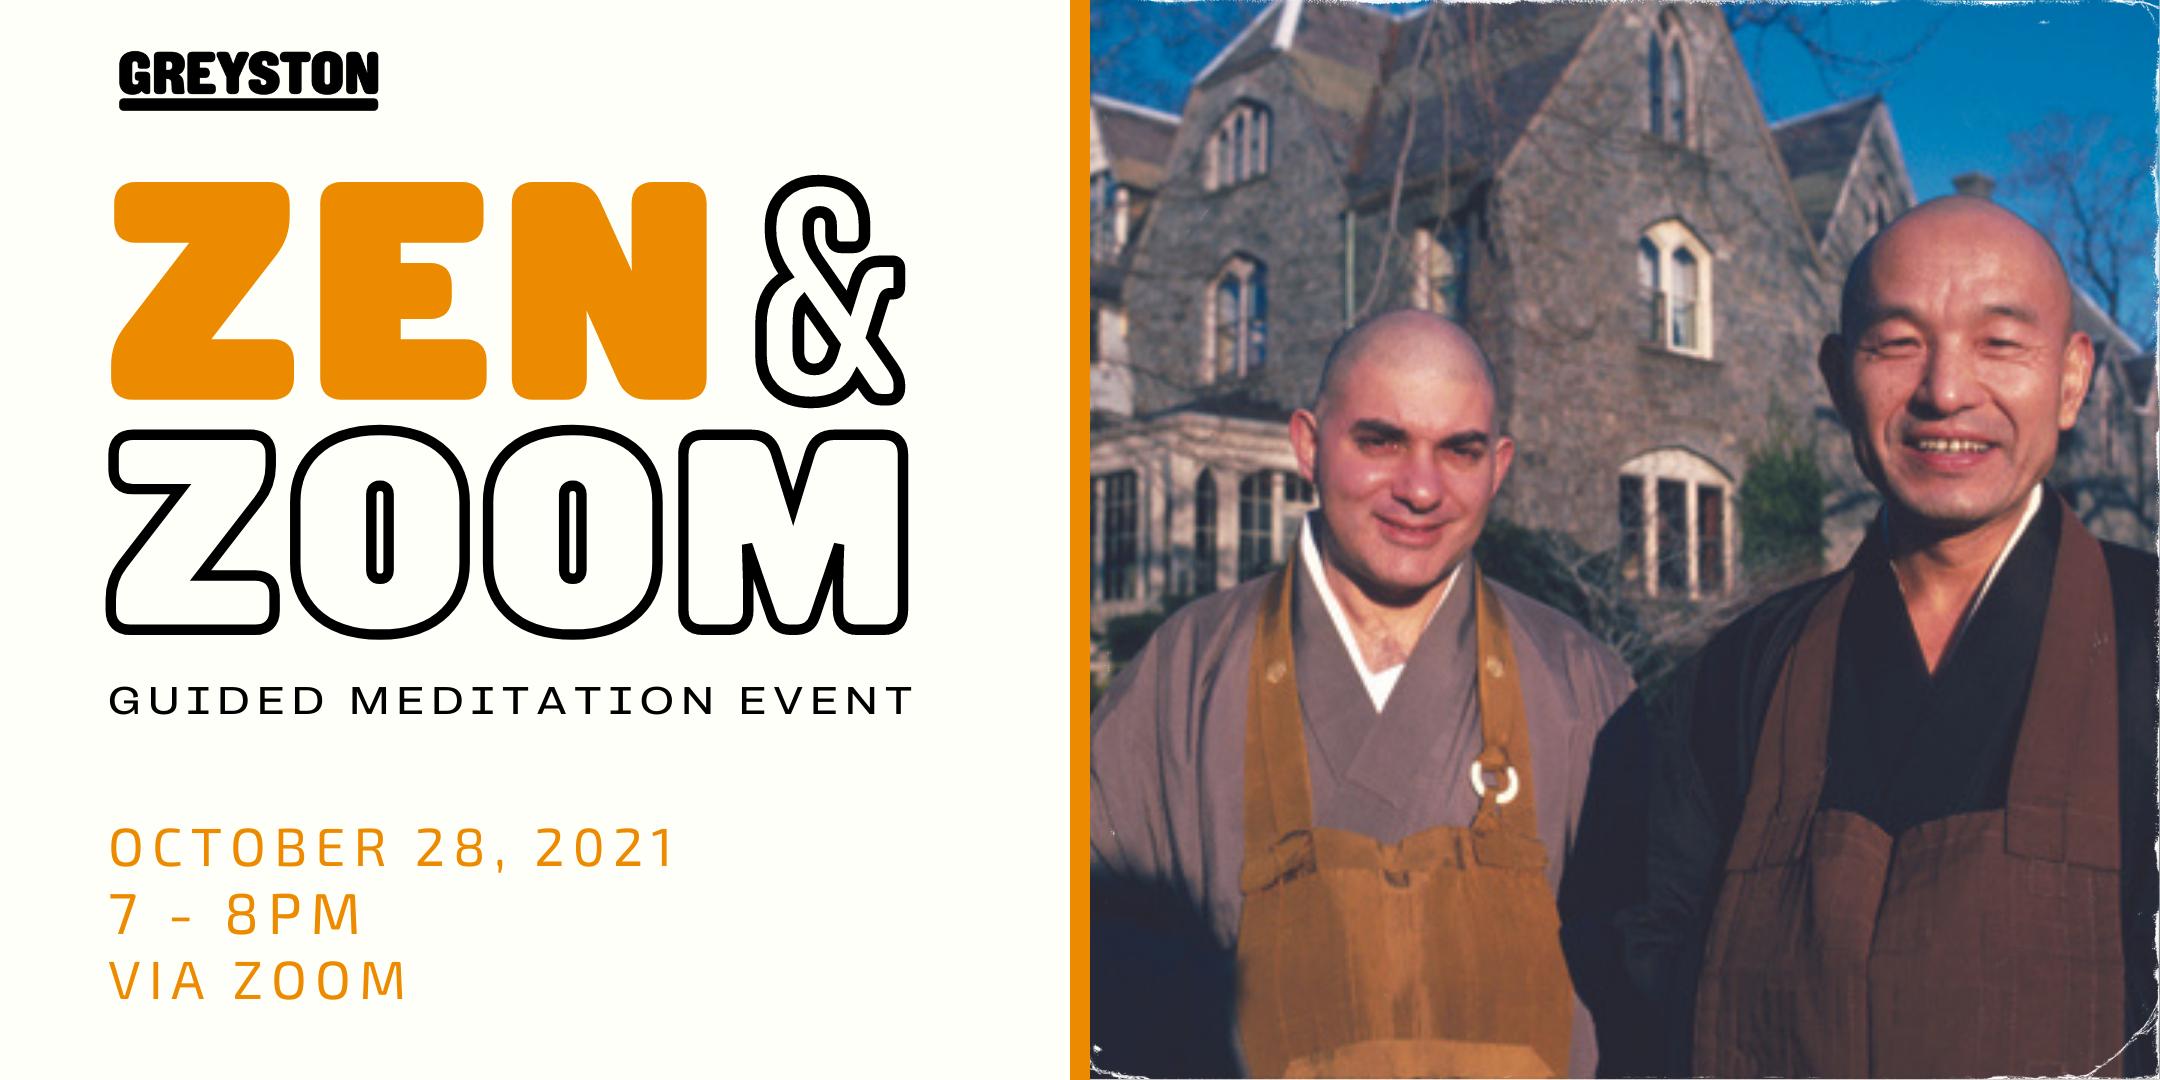 Zen & Zoom Greyston Meditation Event | Greyston Open Employment